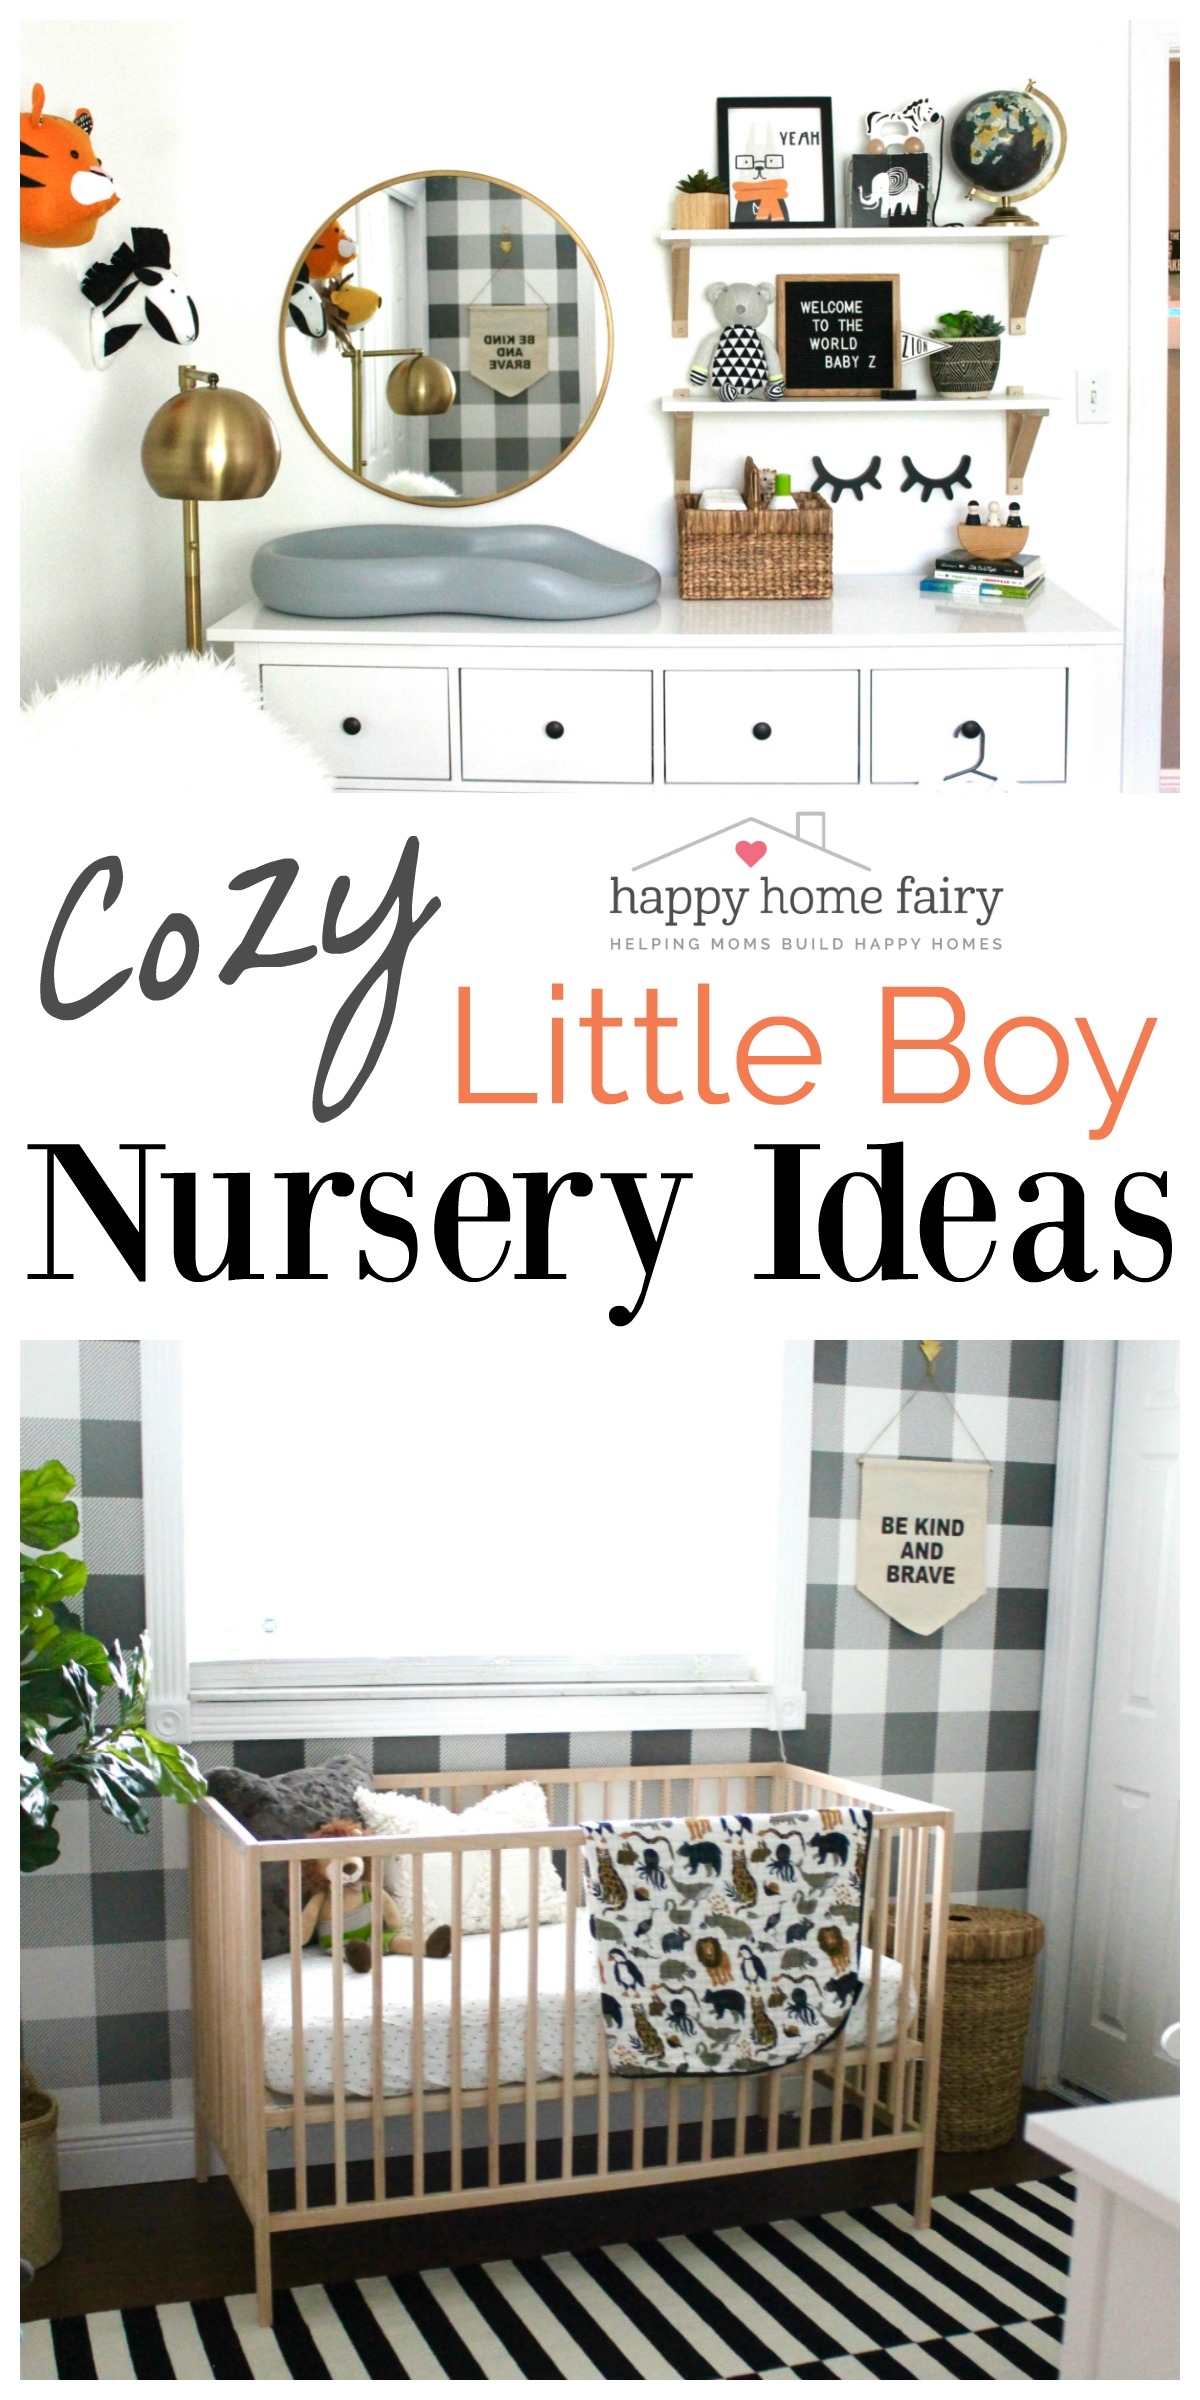 NURSERY REVEAL - Cozy Little Boy Nursery Ideas - Happy Home Fairy